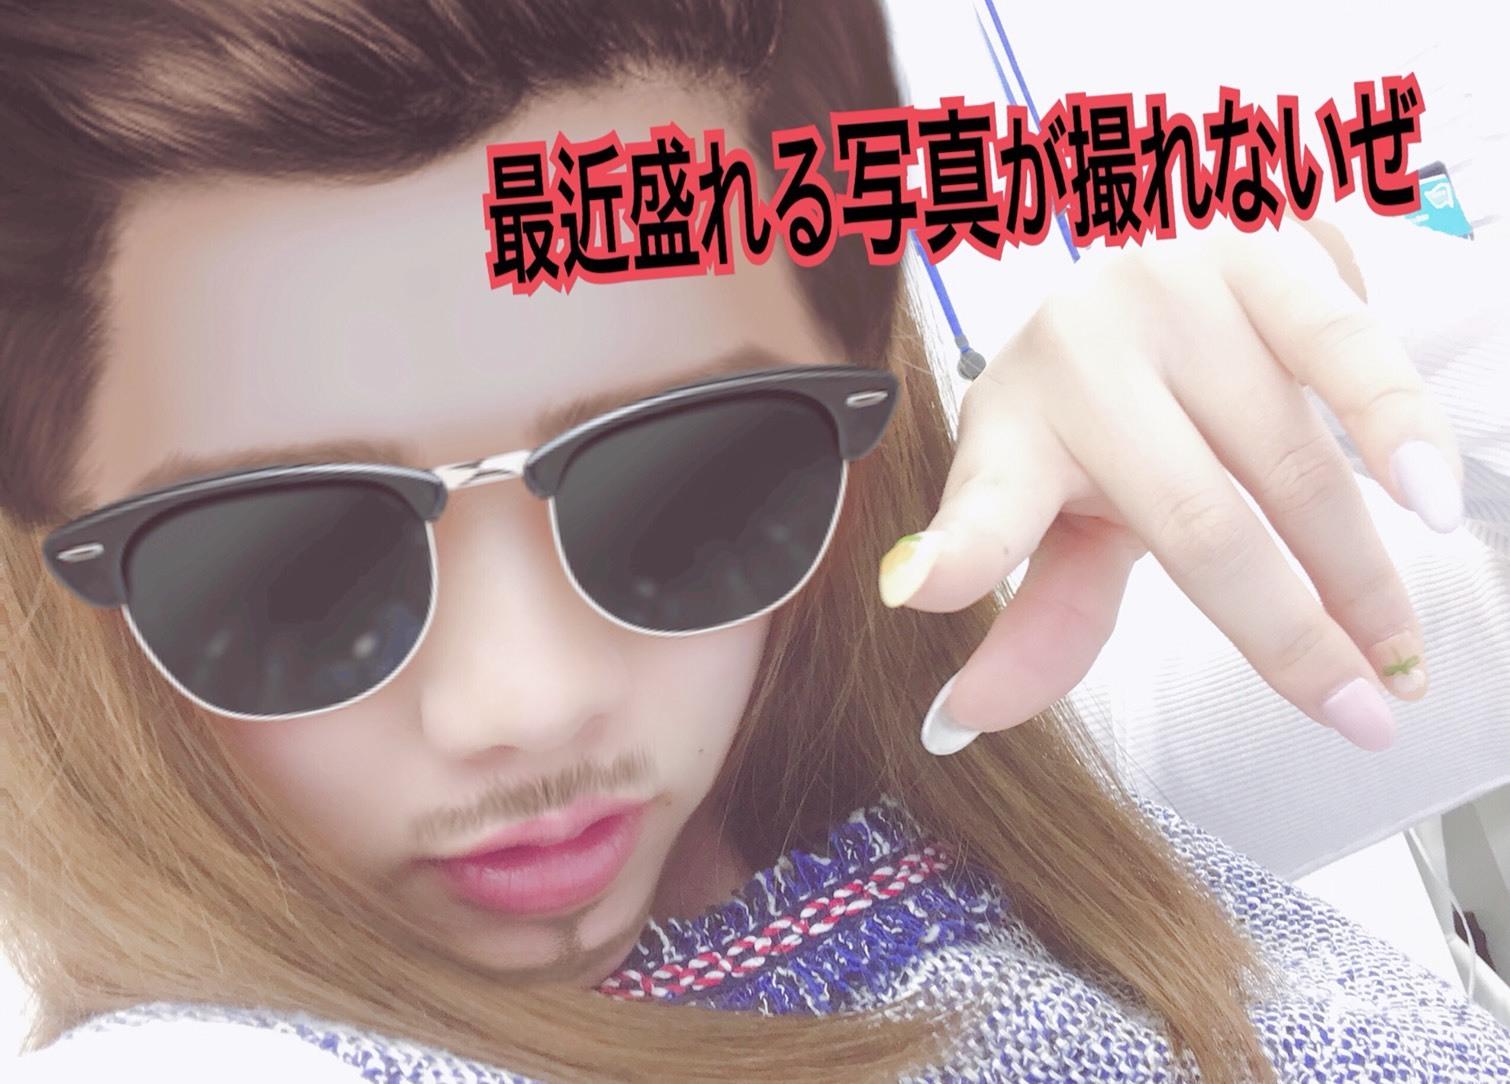 S__34078725.jpg